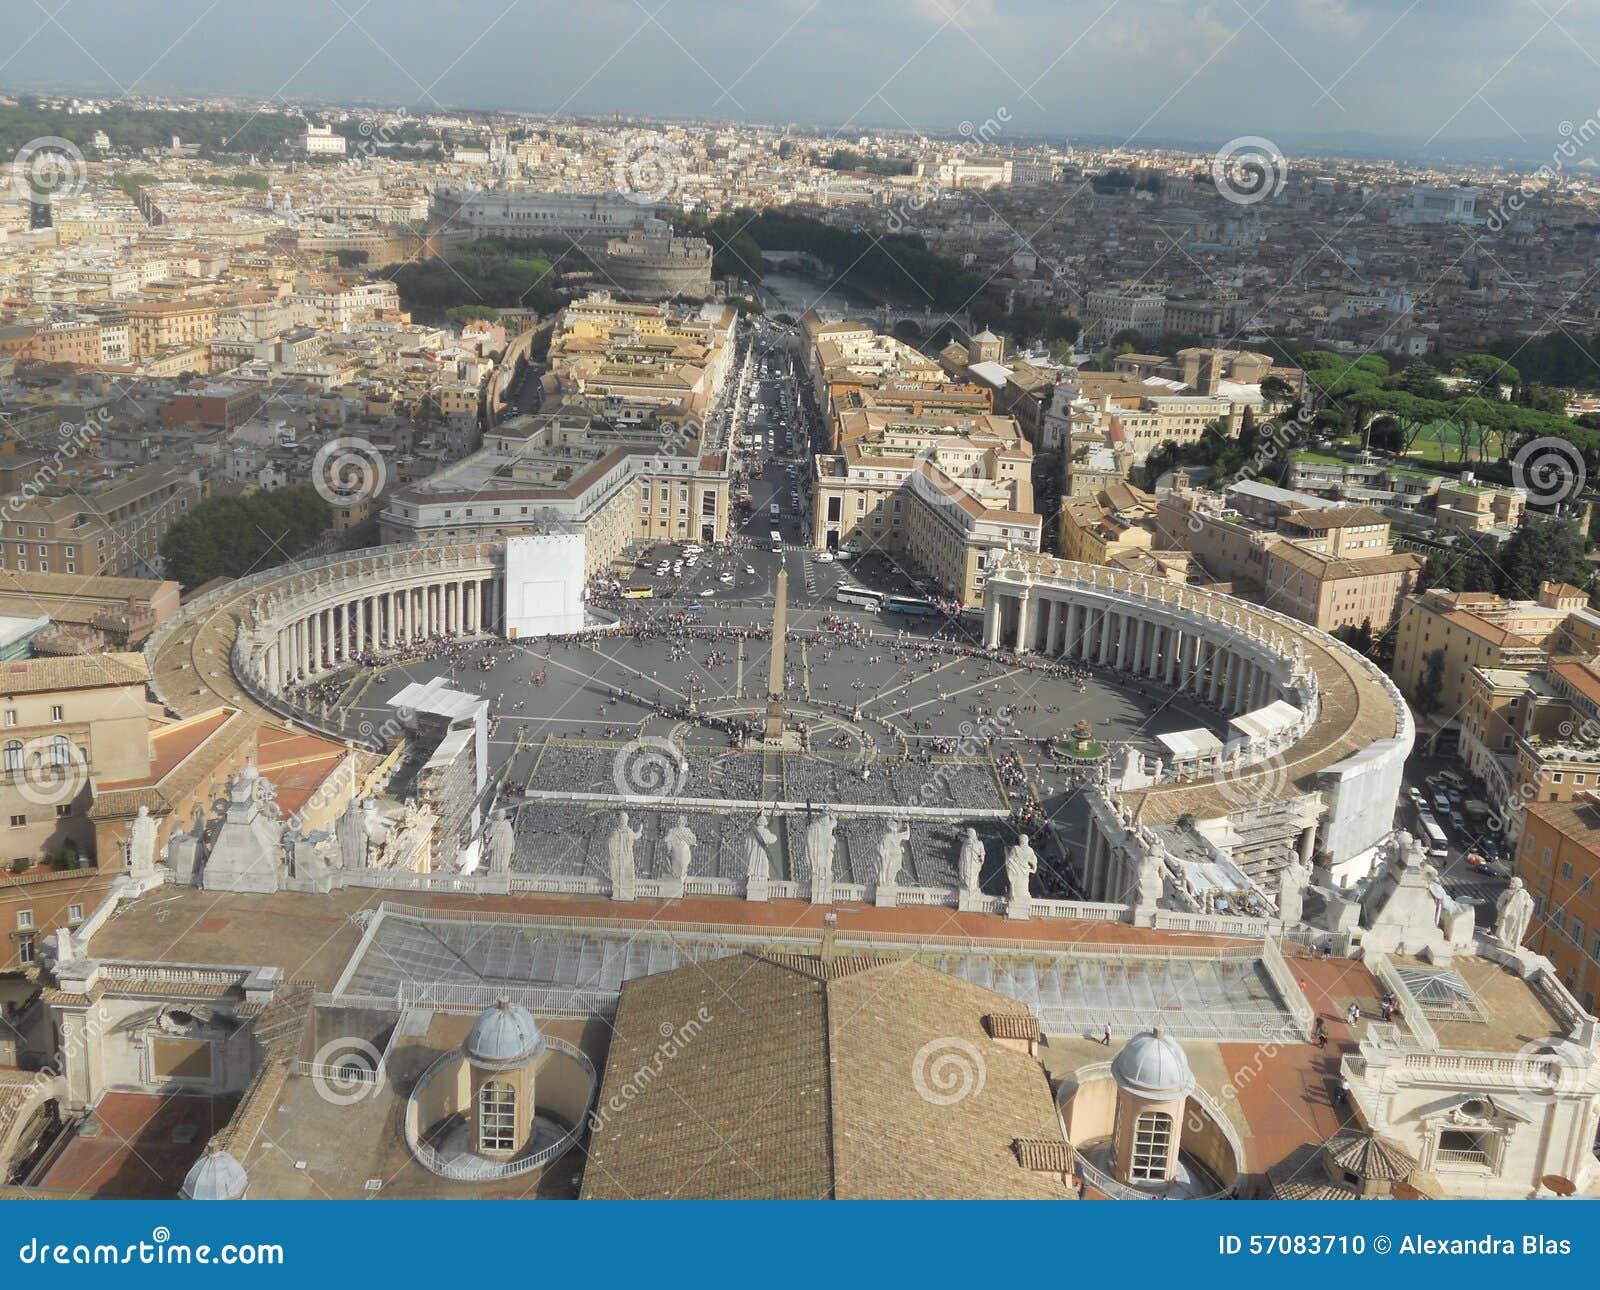 The city of Vatican